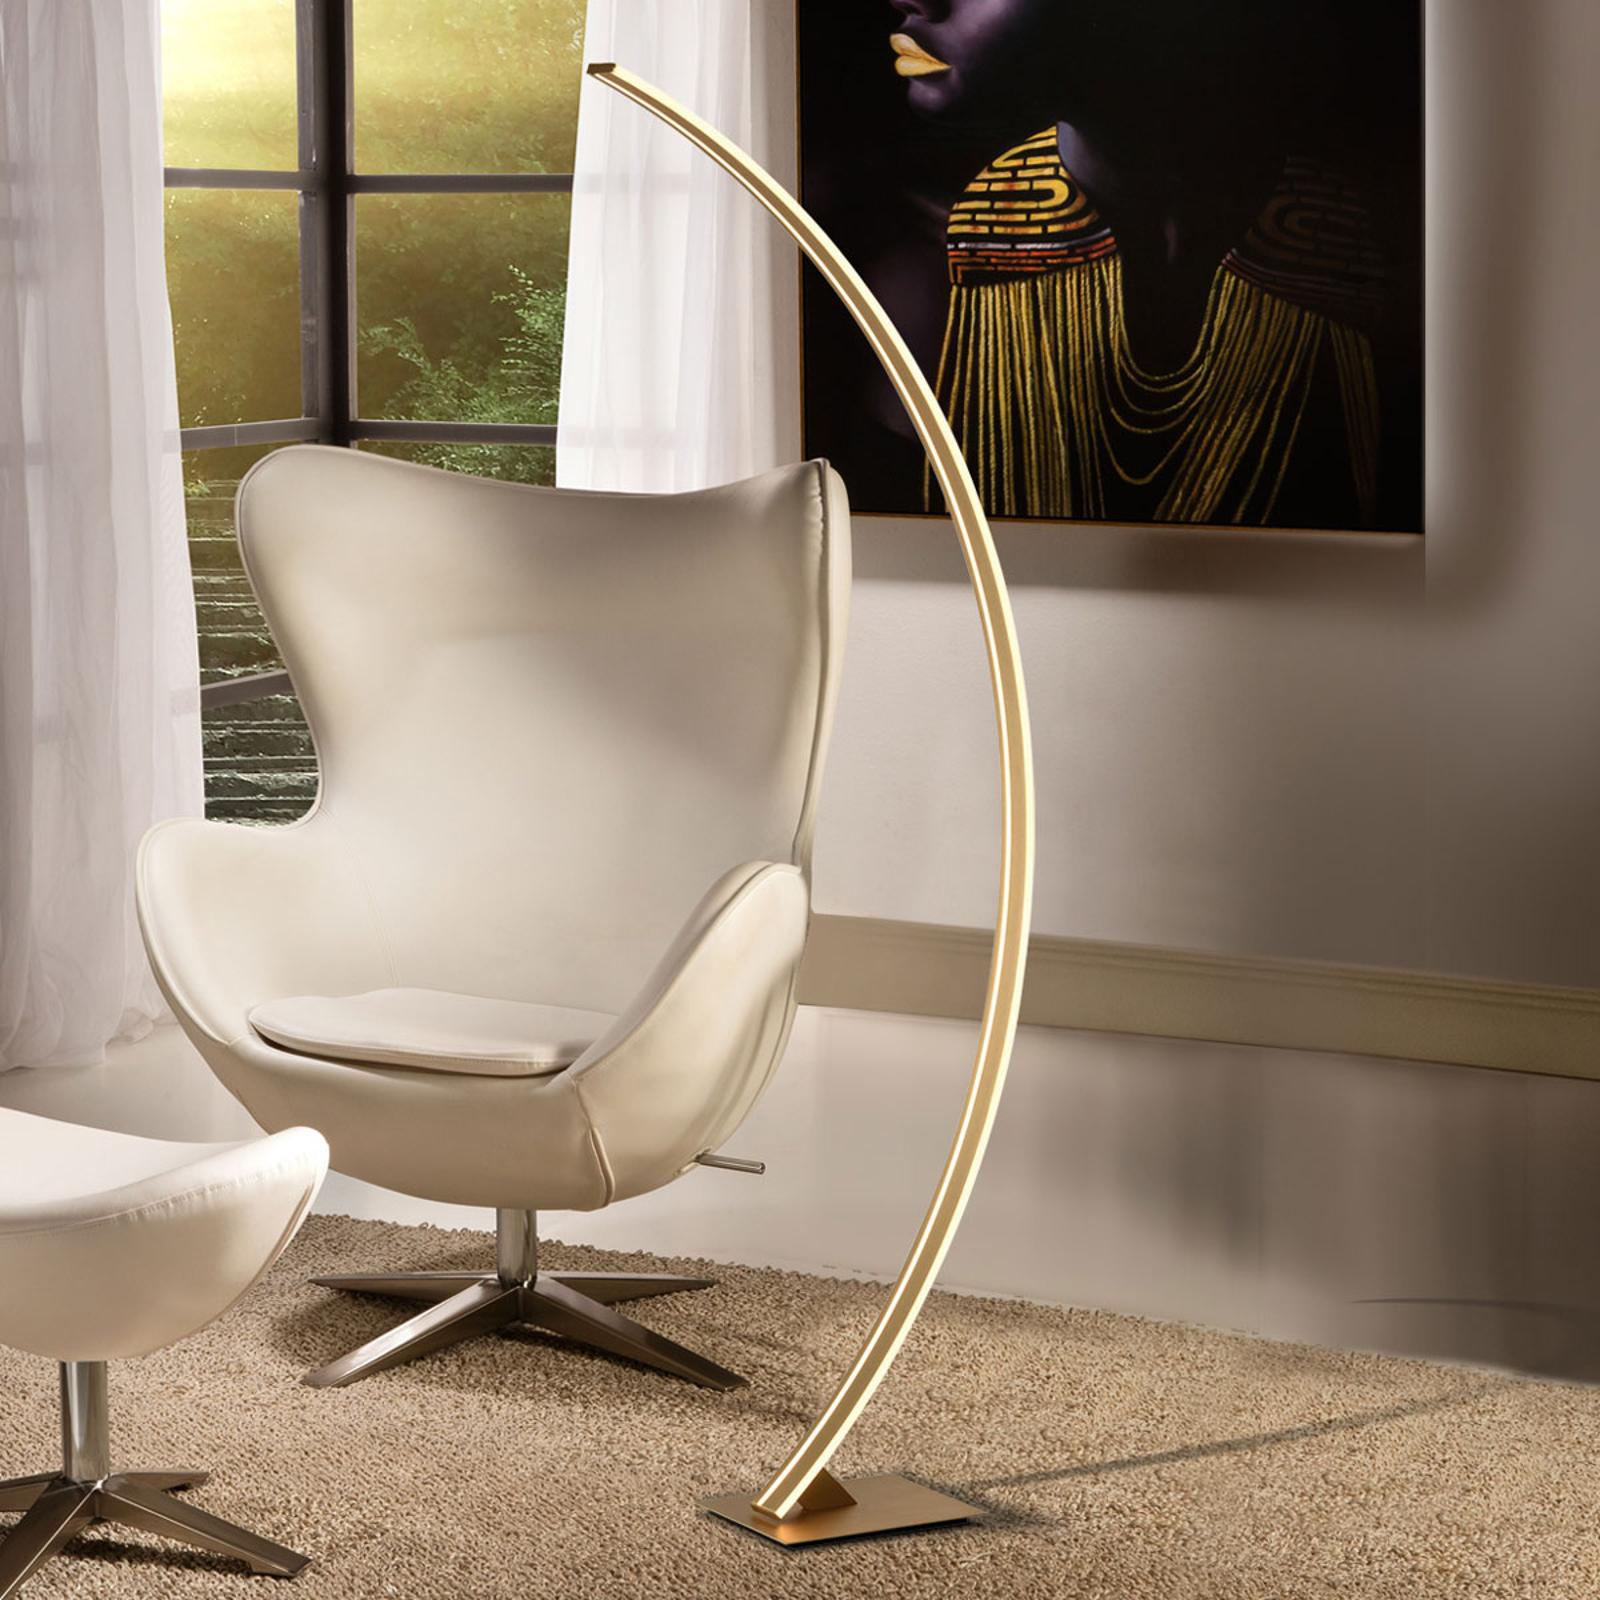 LED boog-vloerlamp Arcus met gouden finish